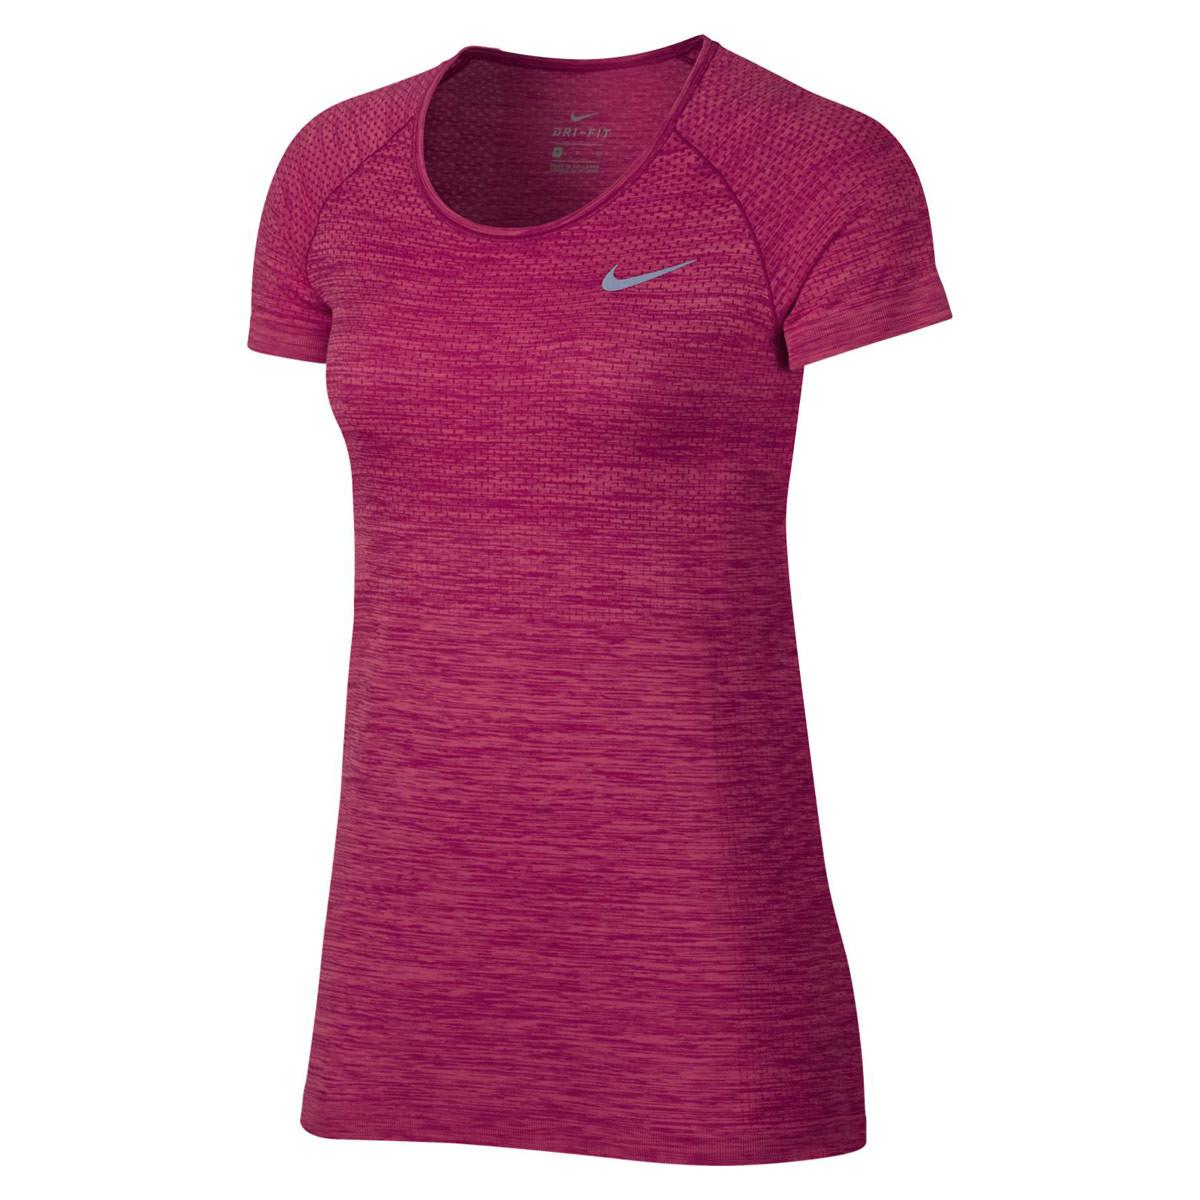 a2627875b2 Nike Dri-Fit Knit Tee - Camisetas de running para Mujer - Rosa